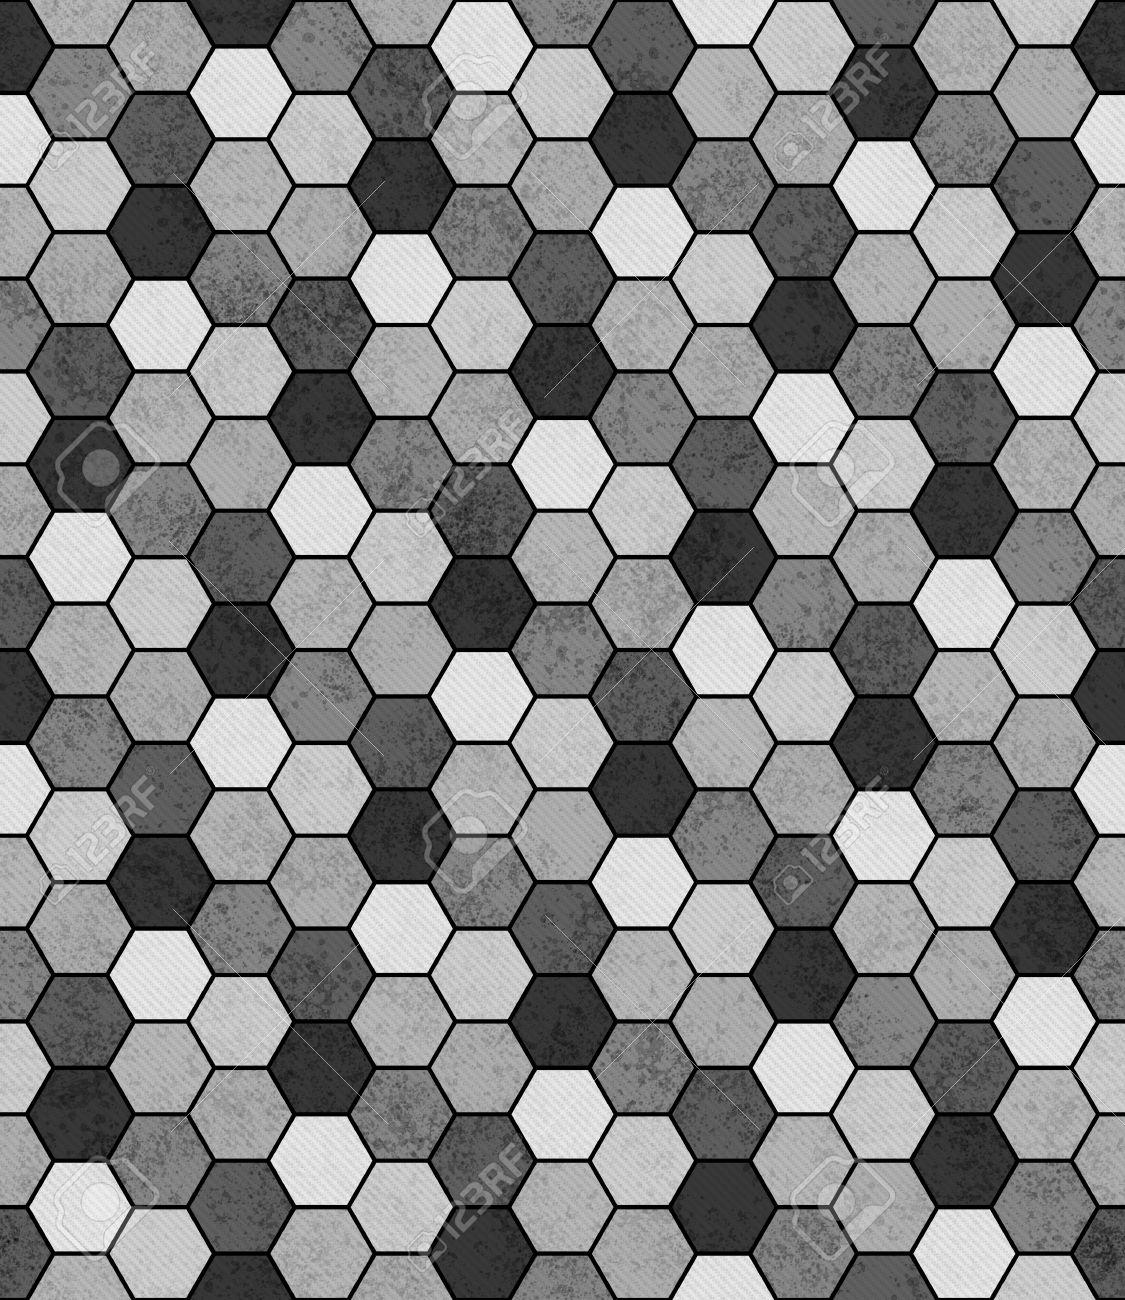 Black And White Hexagon Tile. Black And White Hexagon Tile Pattern ...